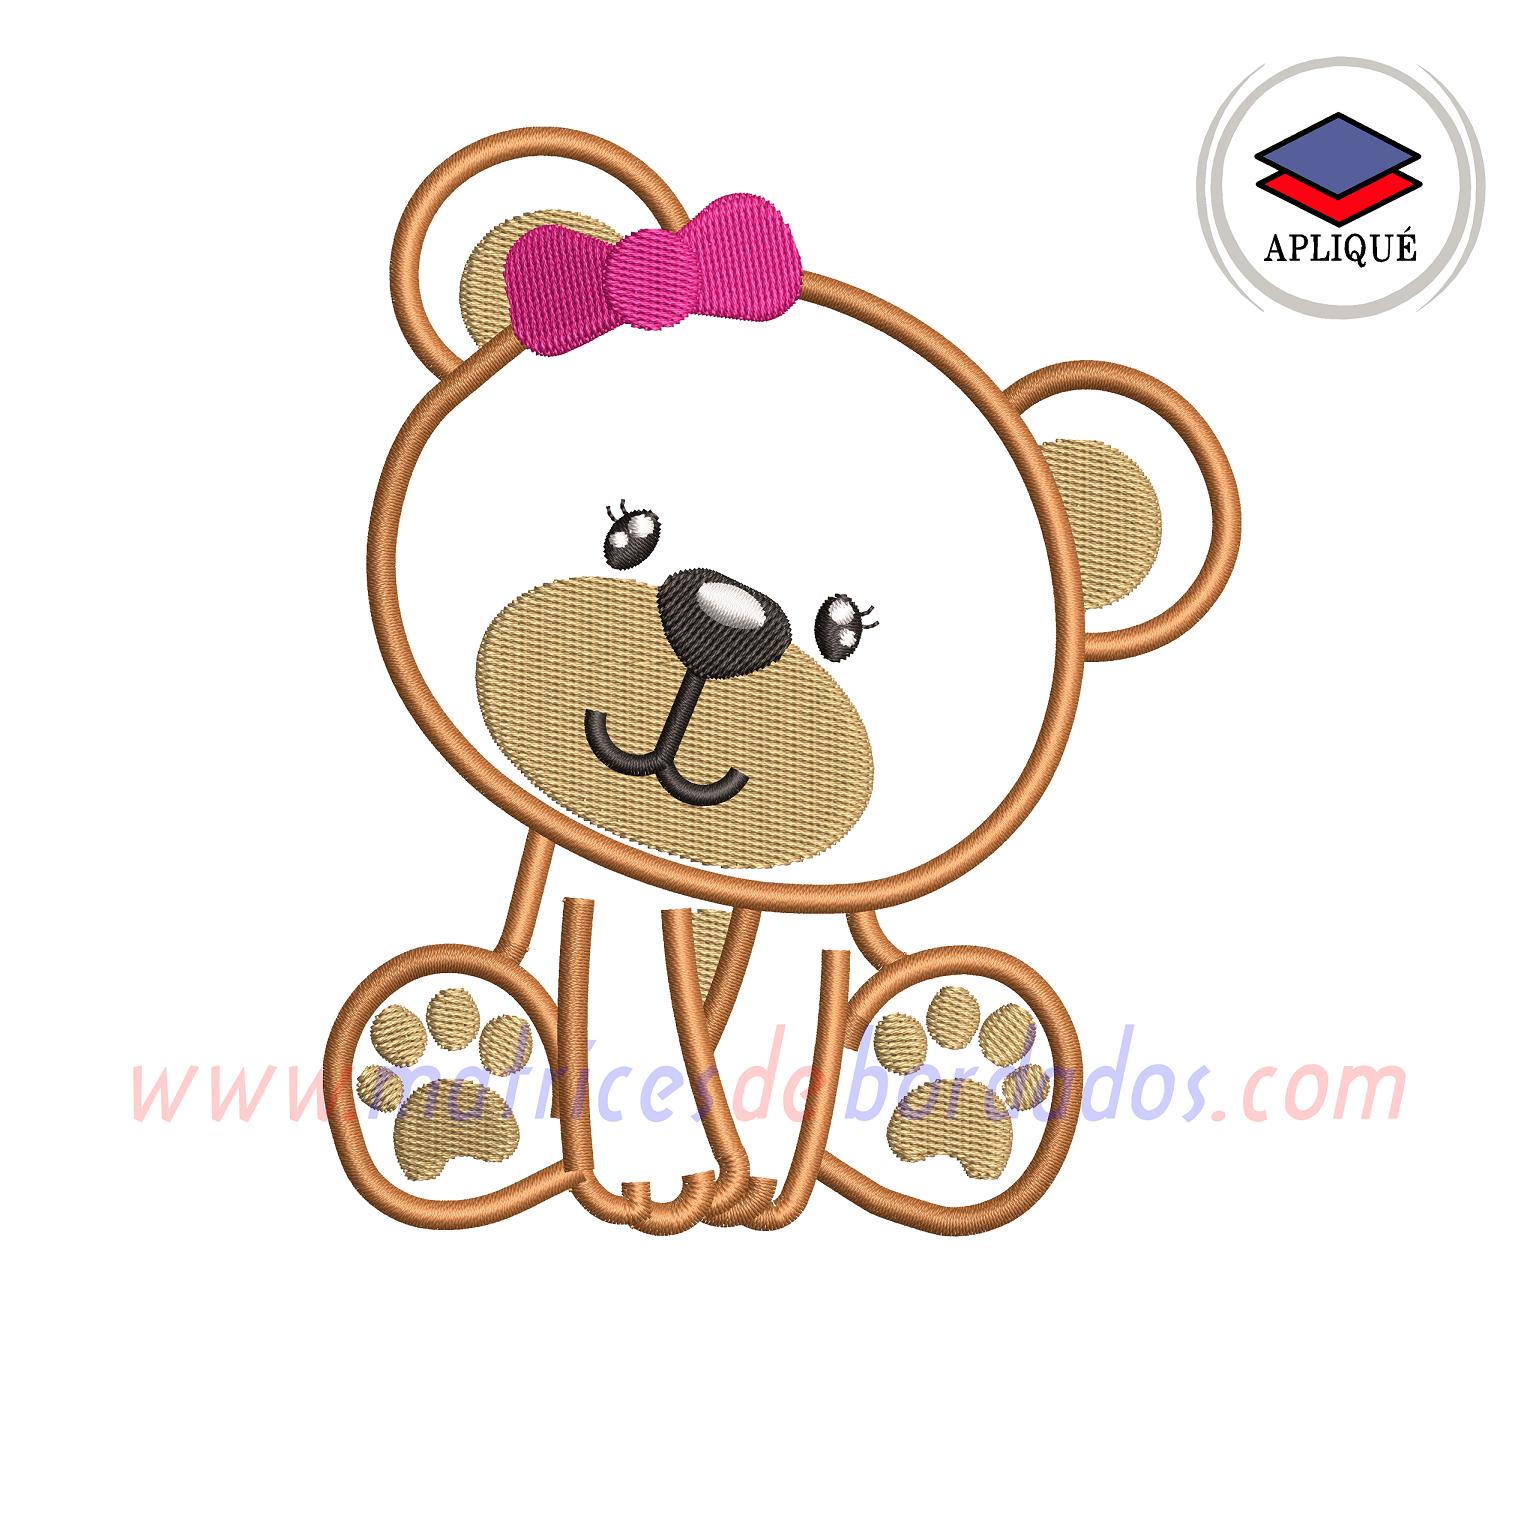 QD75VB - Oso Apliqué